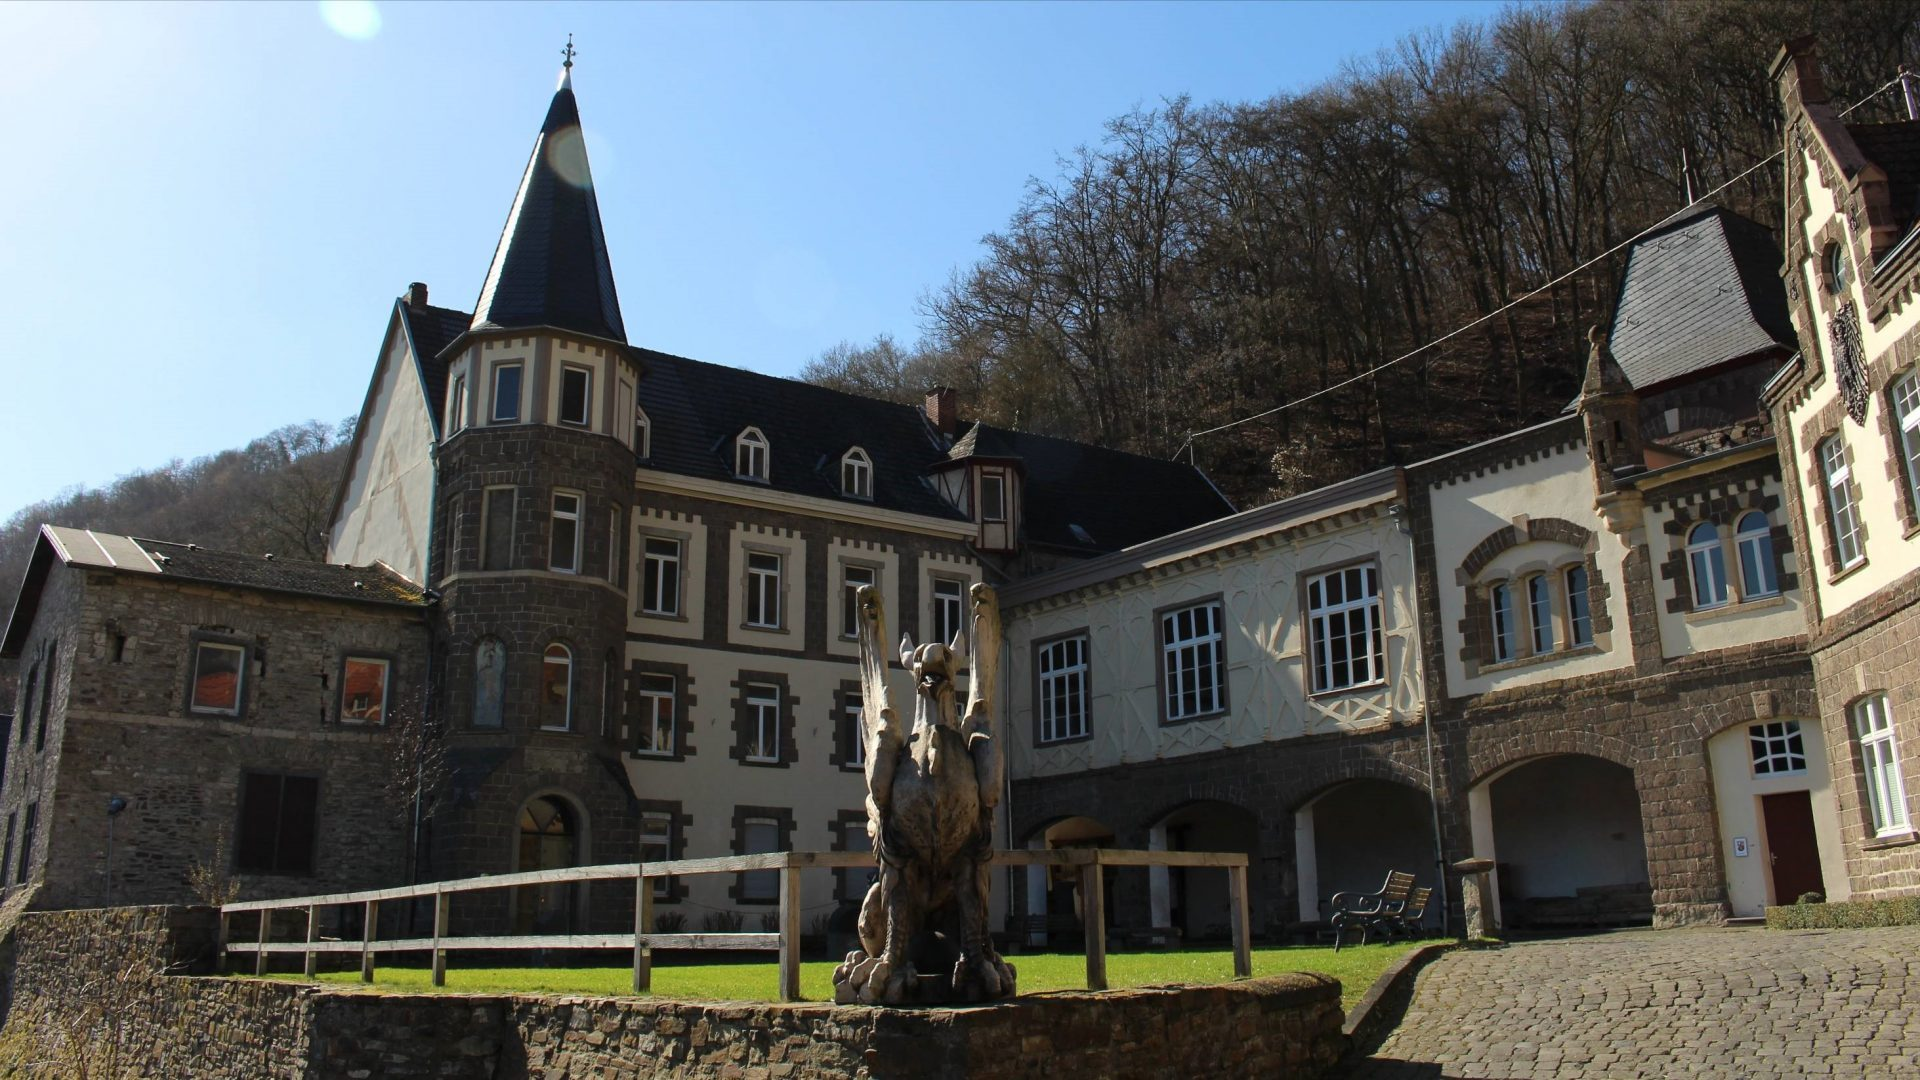 Burg Brohleck